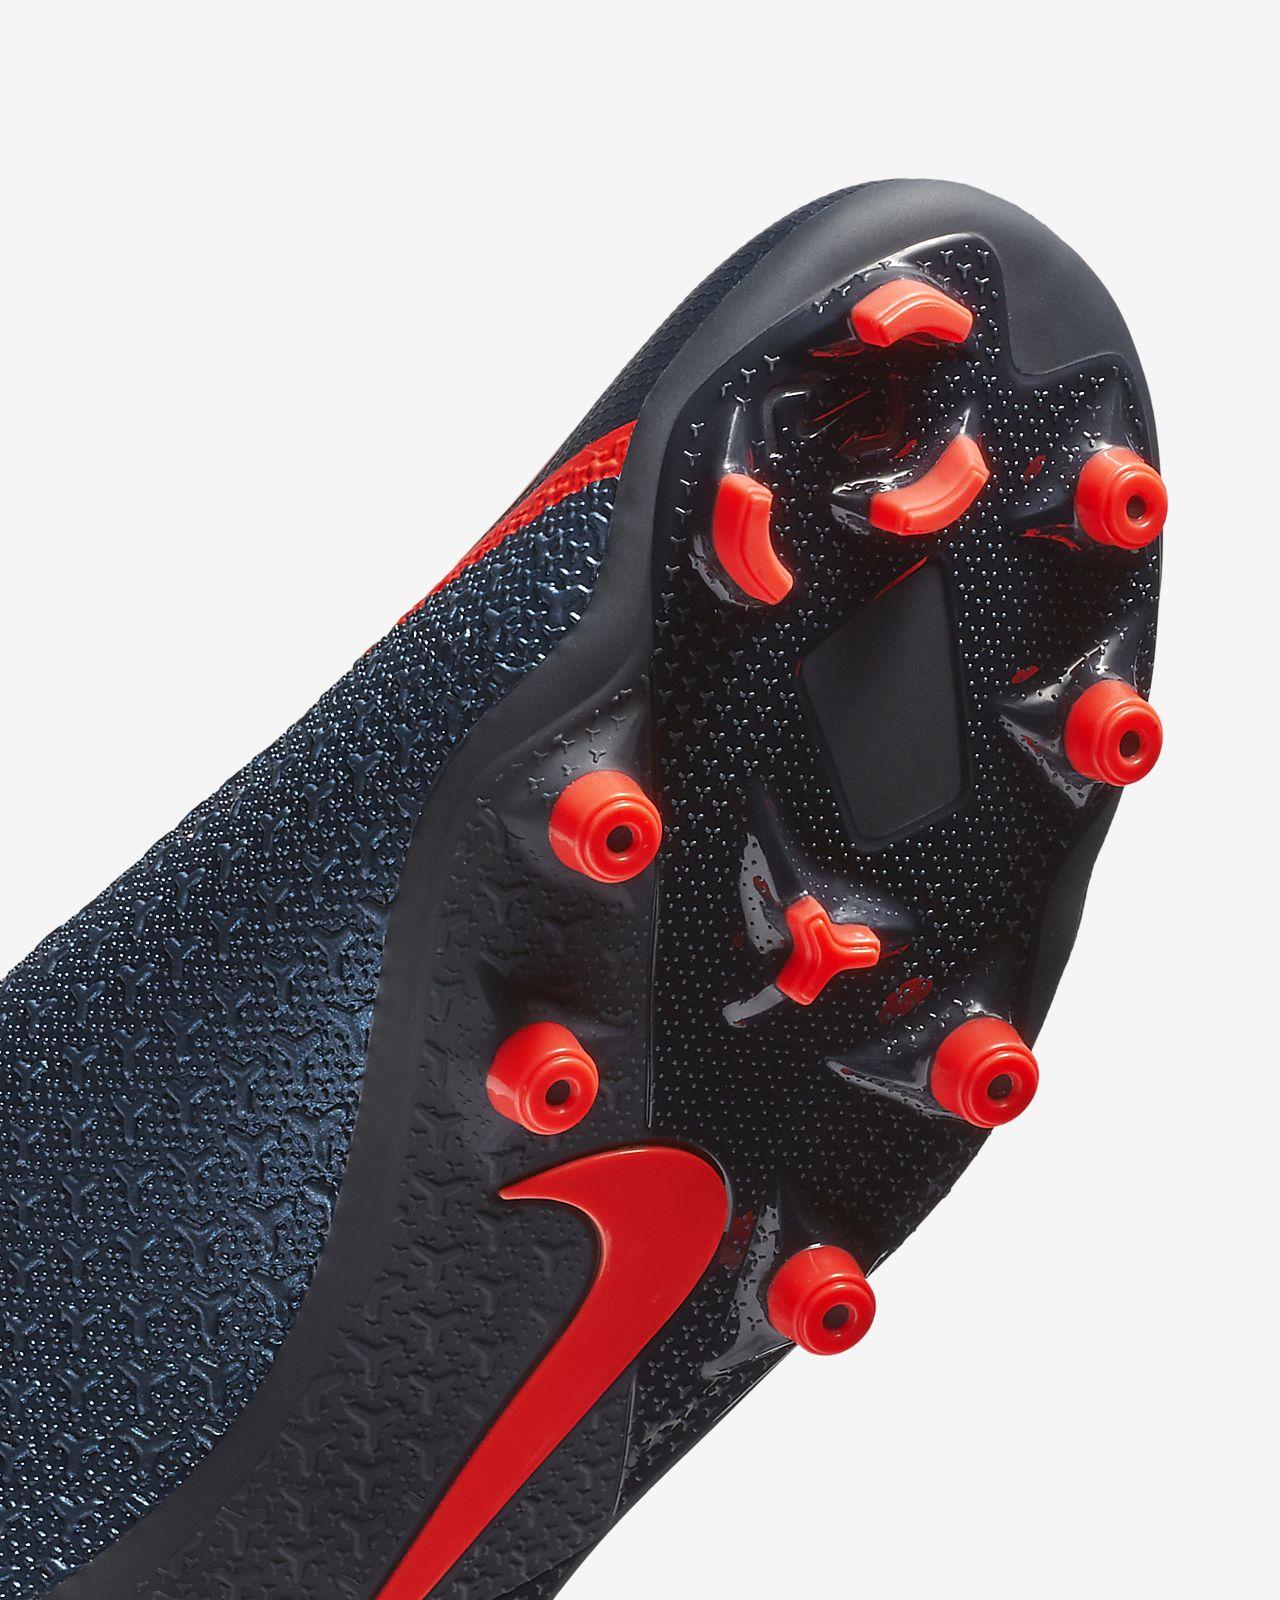 Nike PhantomVSN Academy Dynamic Fit MG Multi-Ground Soccer Cleat ... 5c5c539ca0